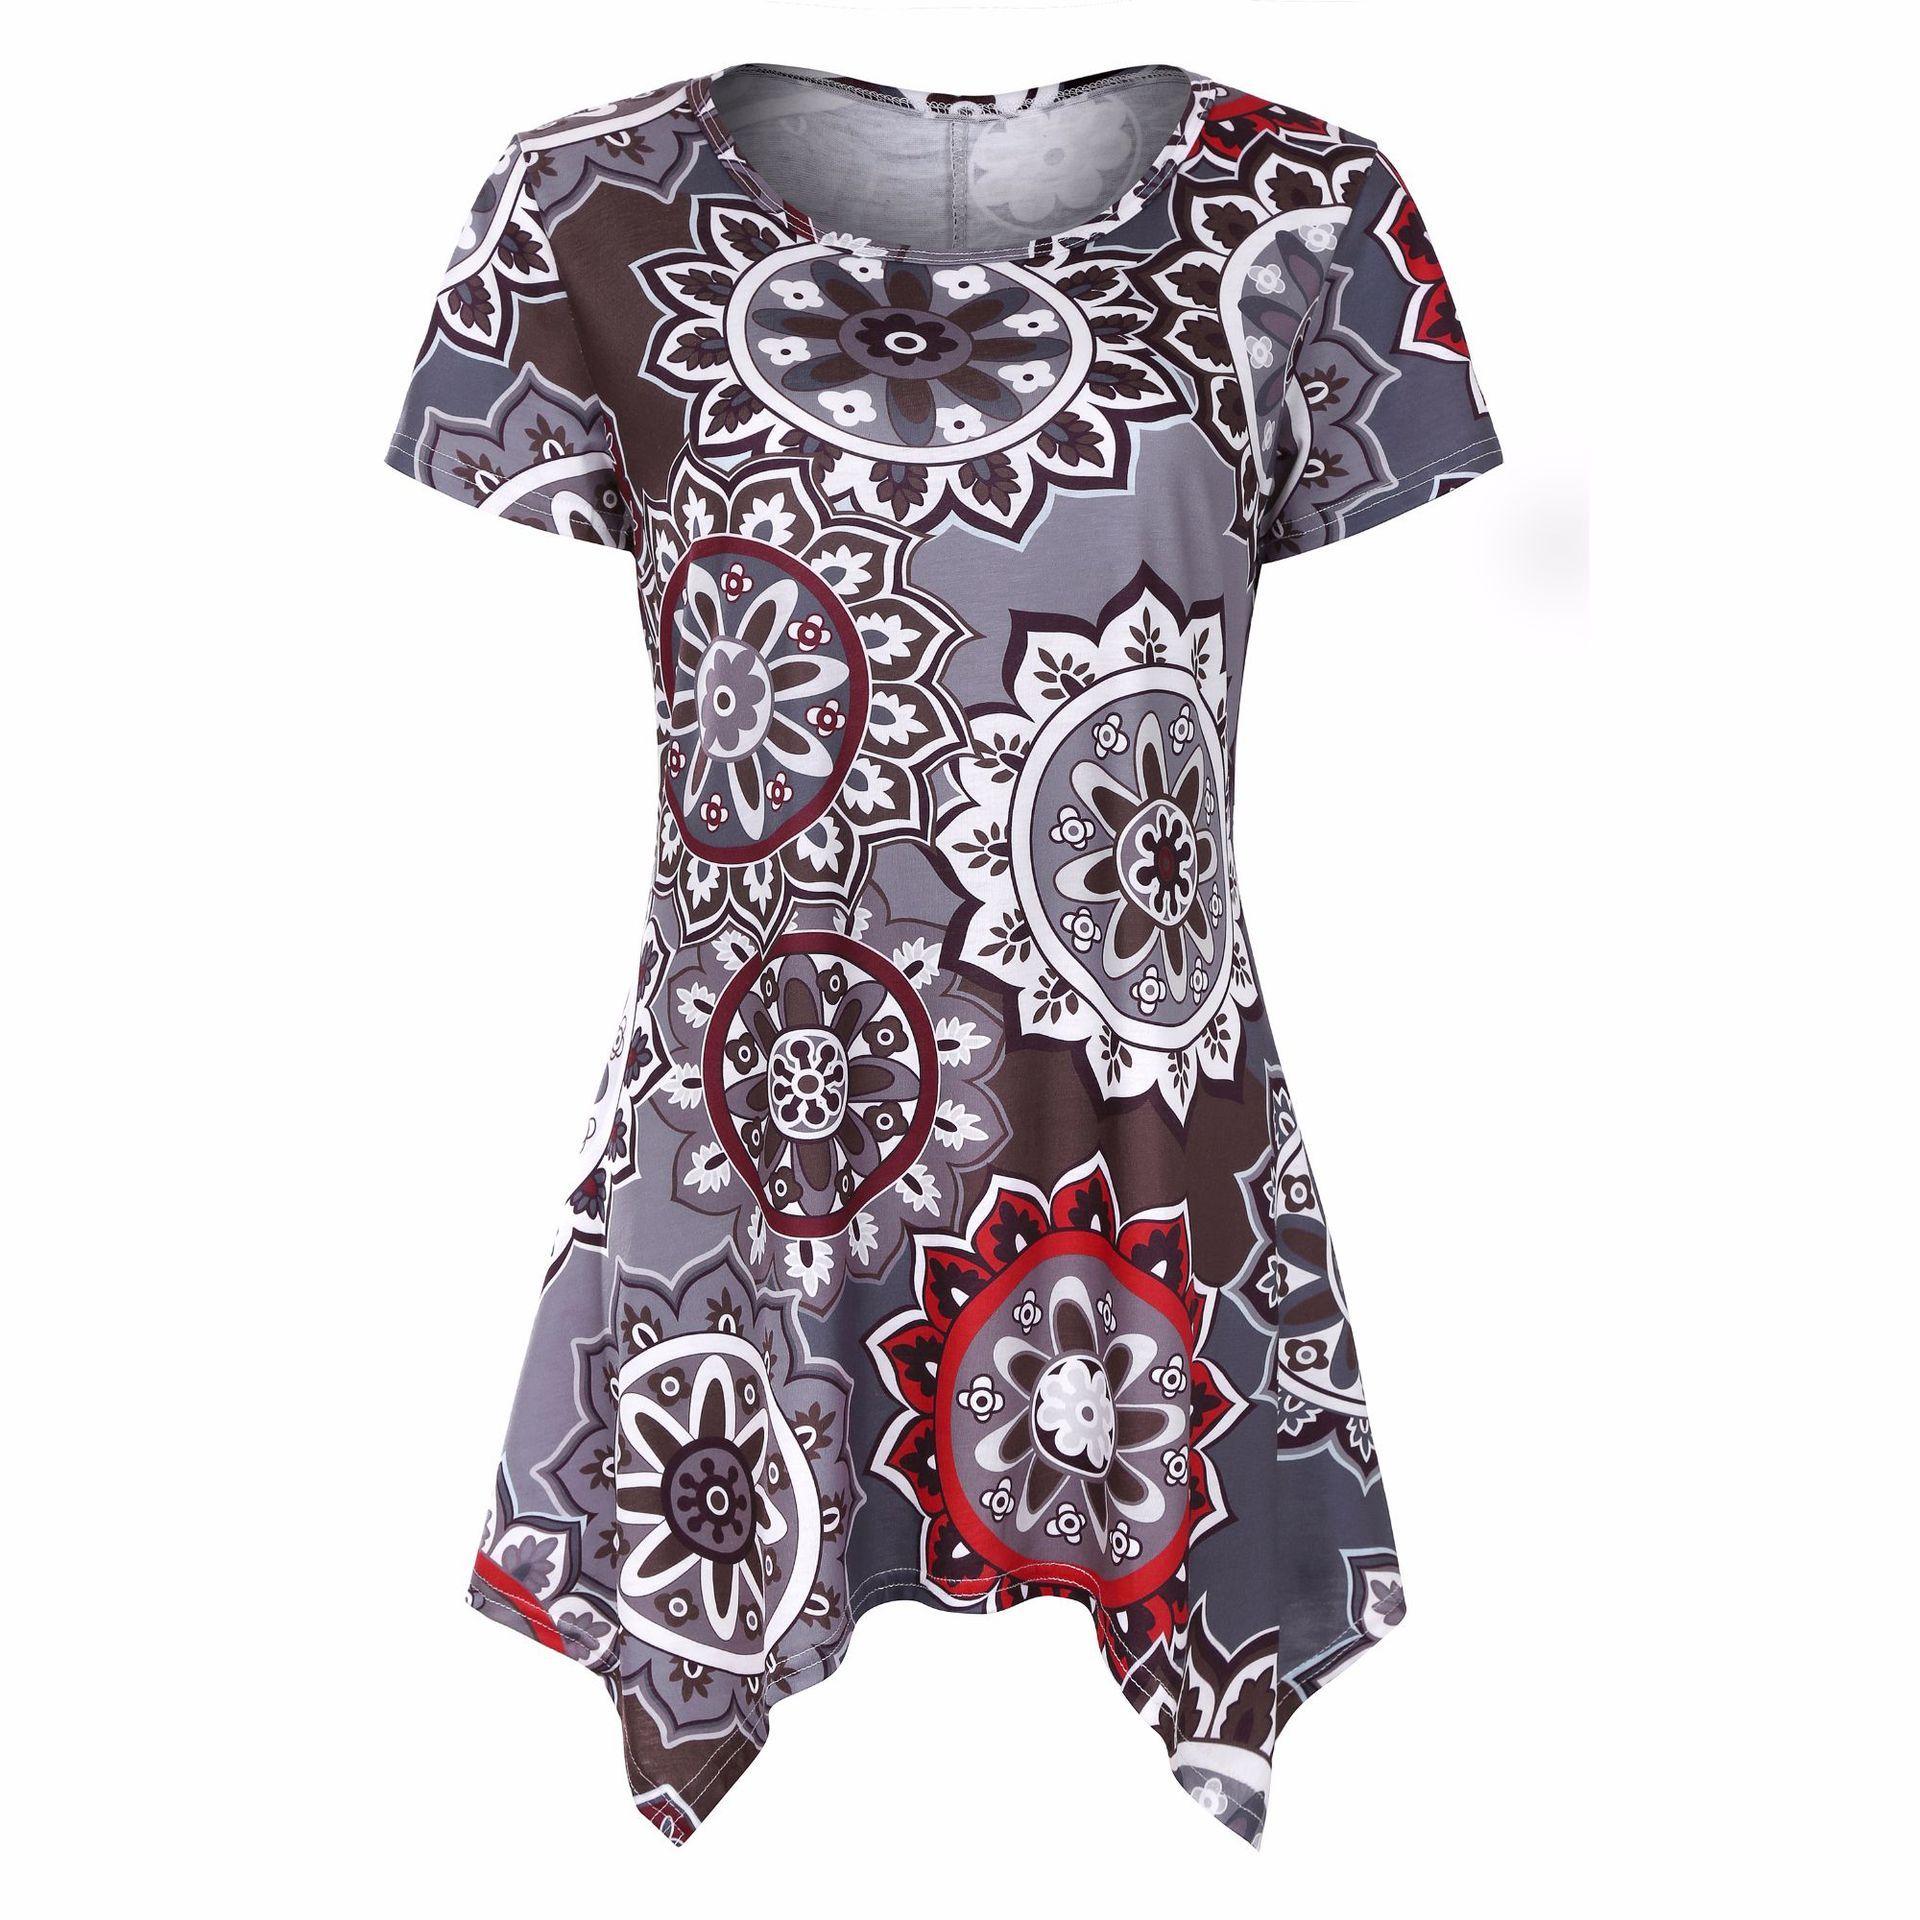 floral asymmetrical dress printed shorts sleeve women pullover Bohemia style summer dress shirt flower pattern O-neck T-shirts